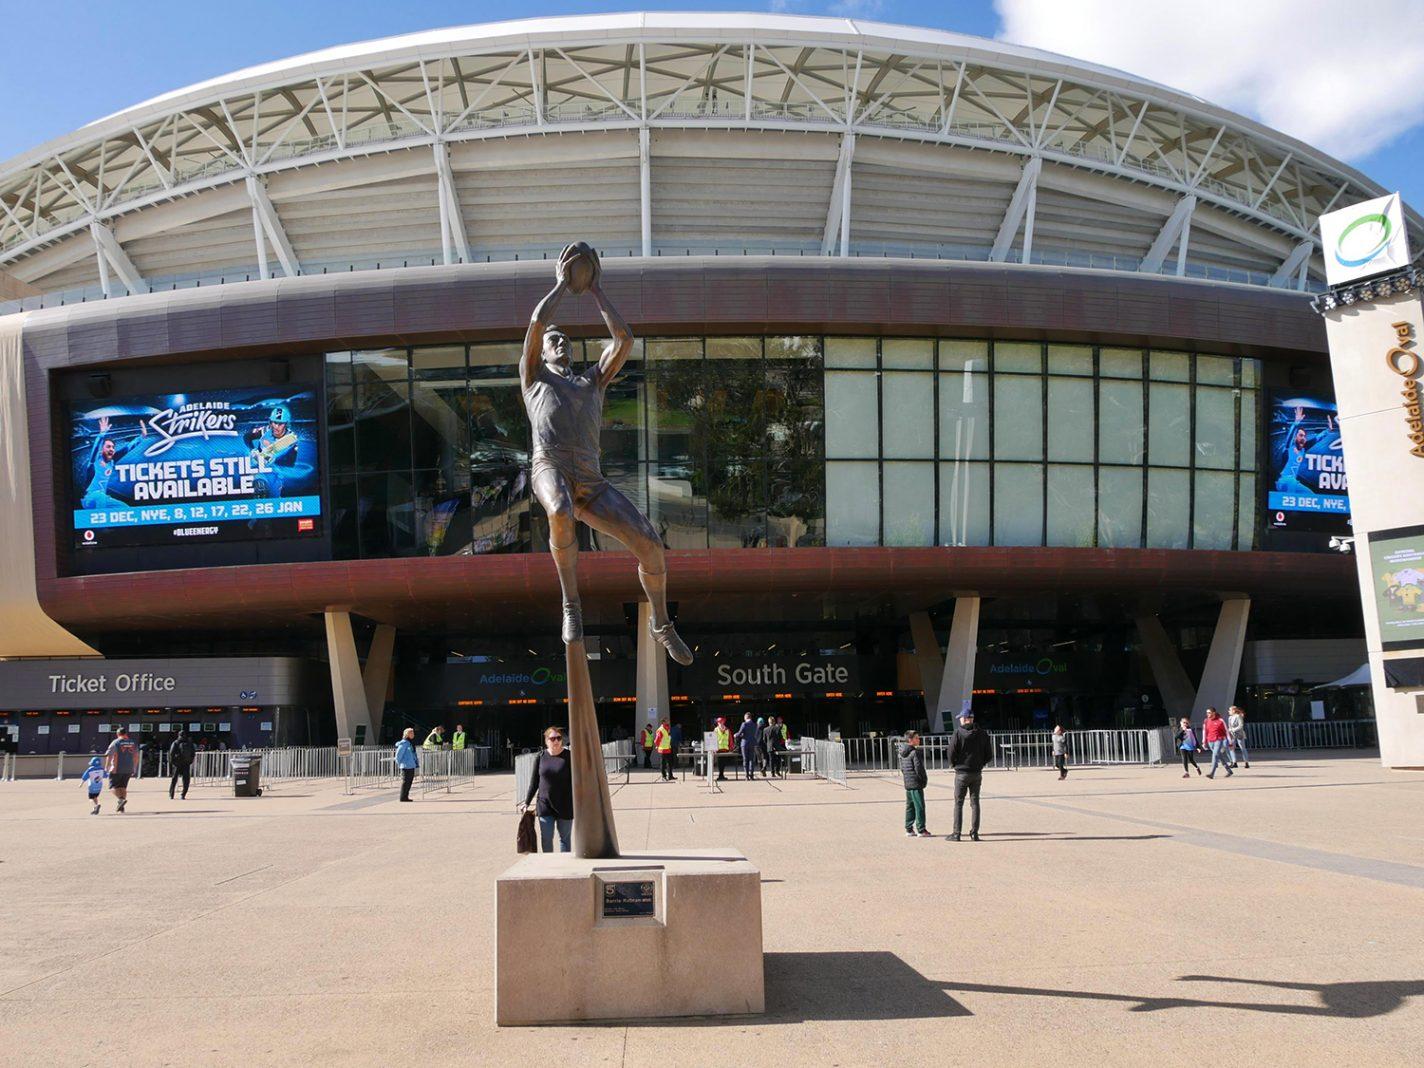 Adelaide Oval stadion - Bezienswaardigheden Adelaide